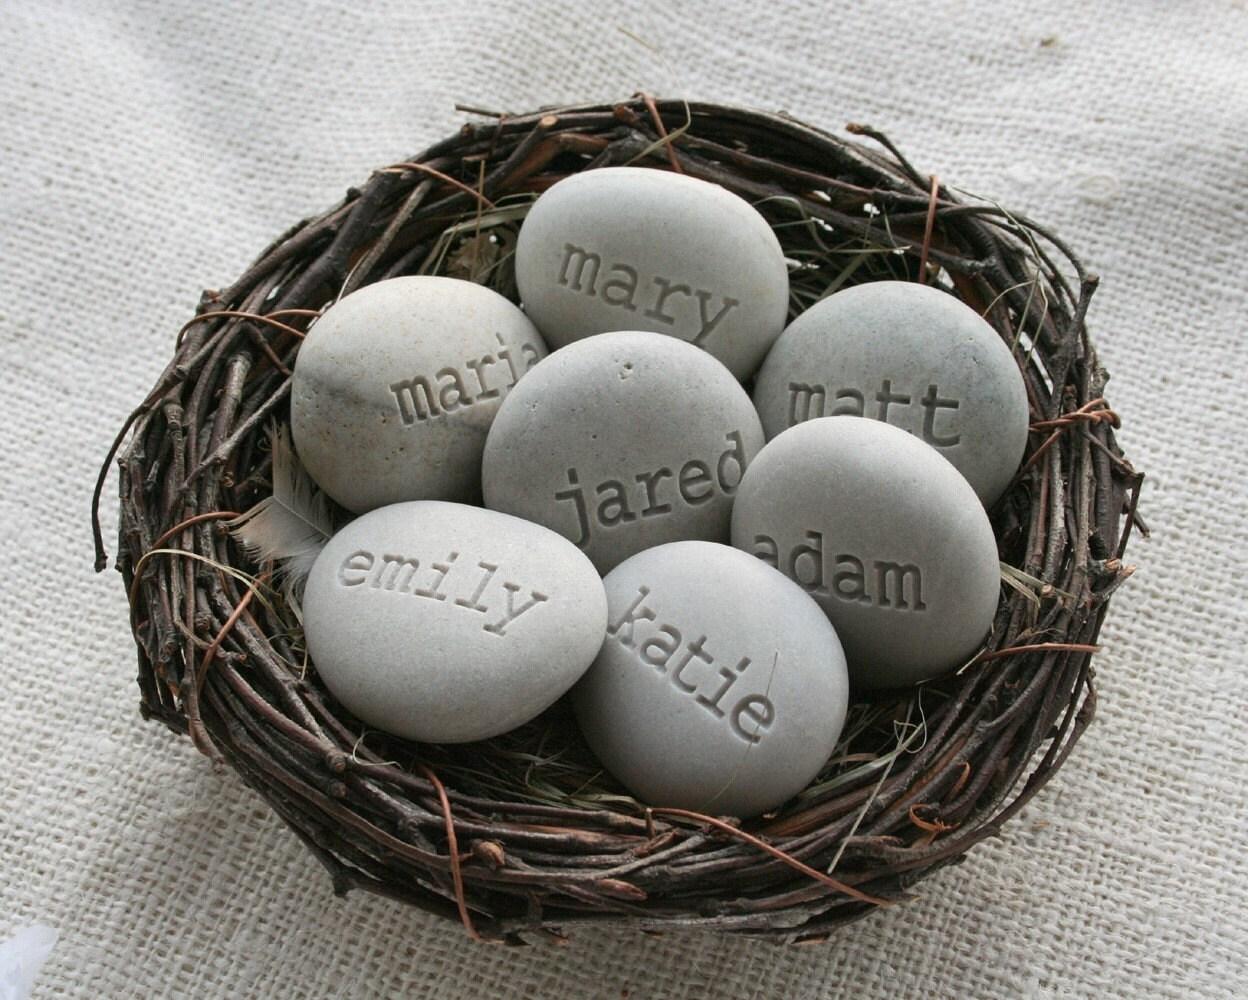 Mom's Nest - Set of 7 name stones in bird nest